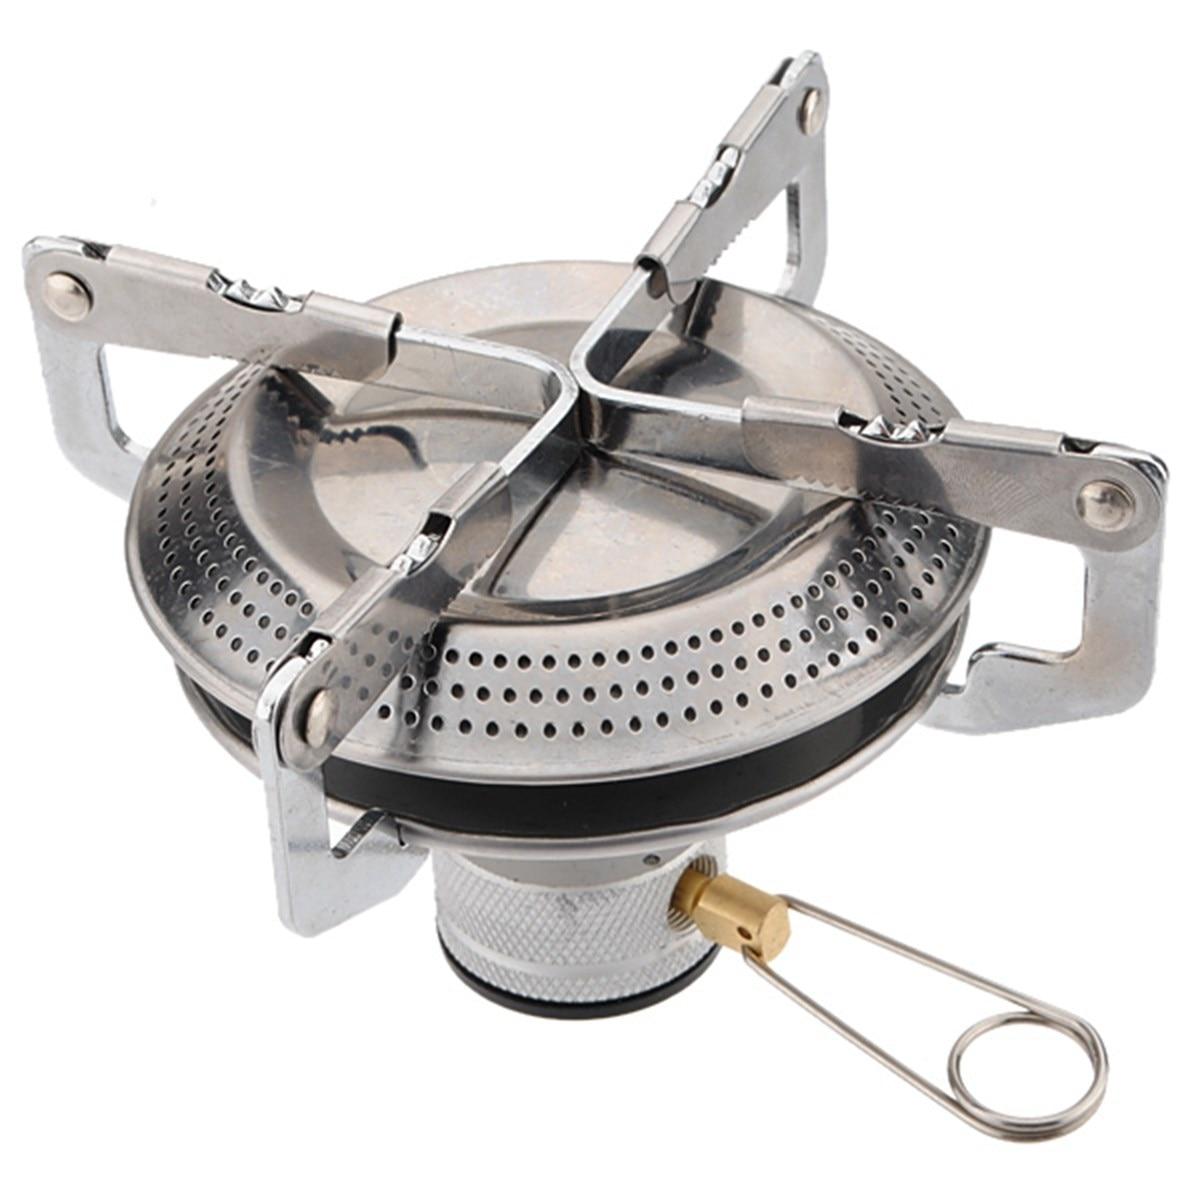 Online Buy Wholesale 3 burner barbecue from China 3 burner ...